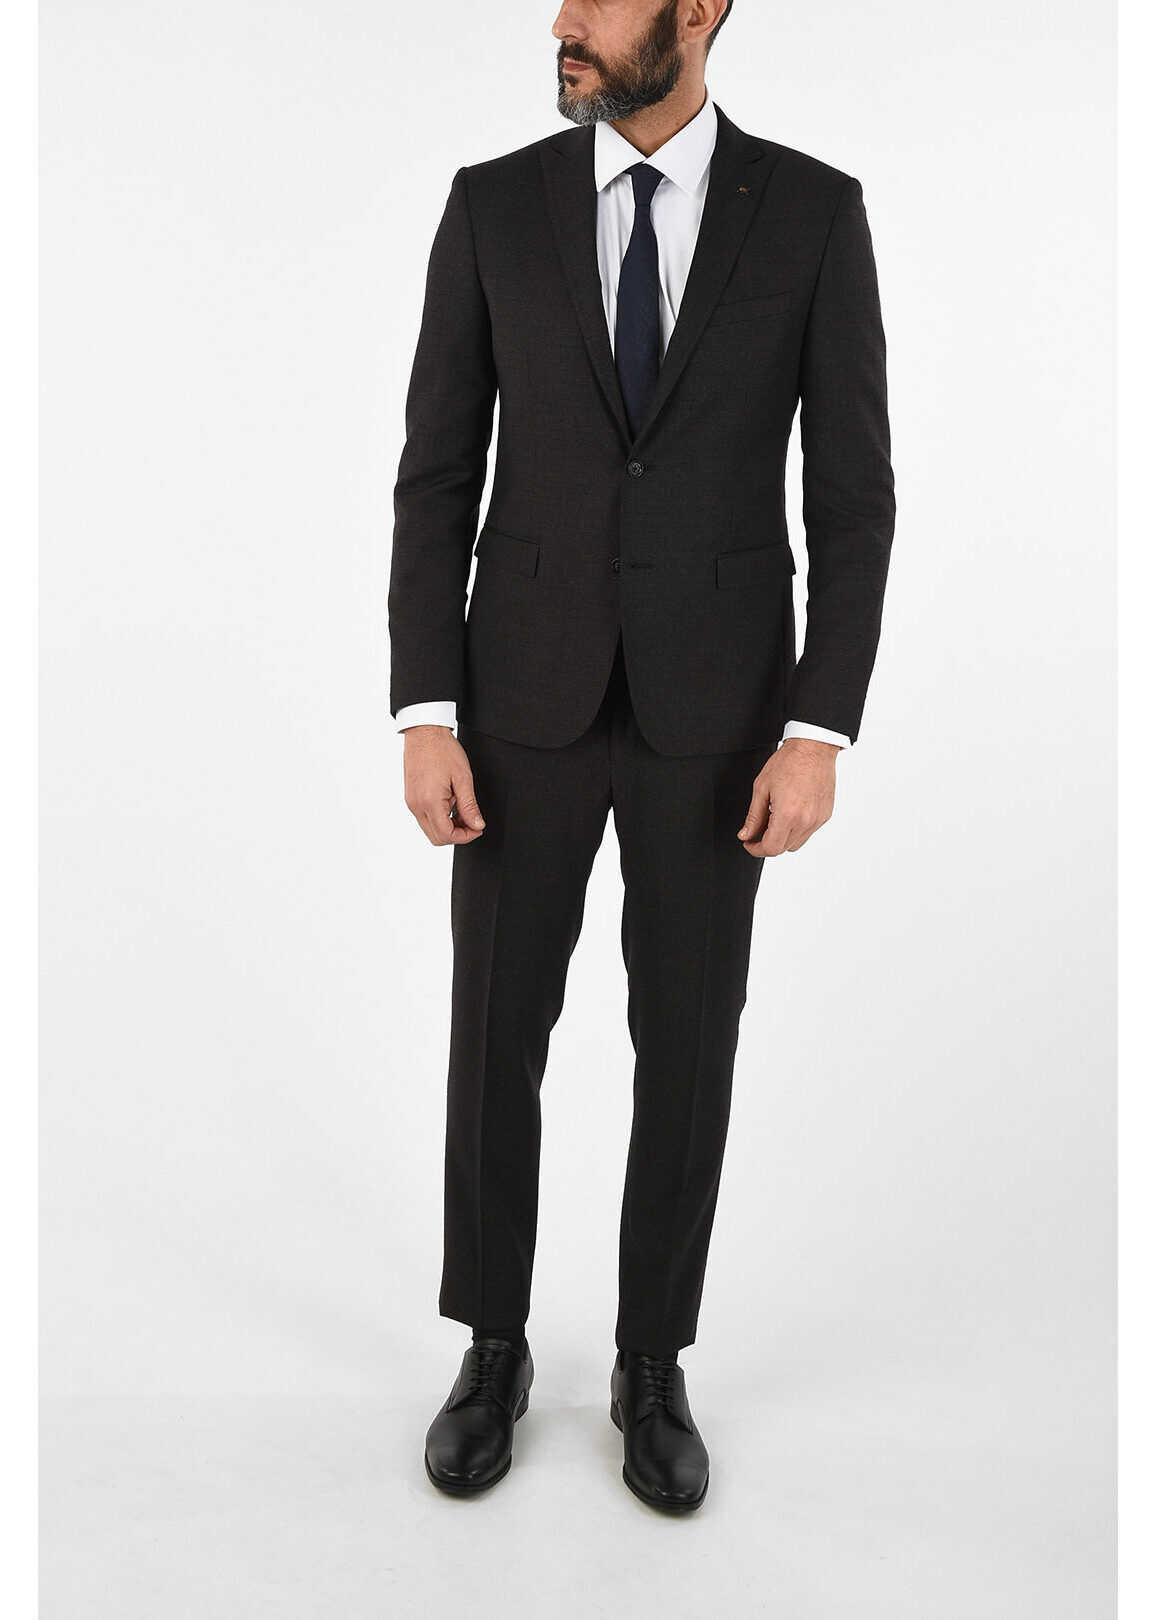 CORNELIANI CC COLLECTION Virgin Wool Single Breasted RESET Suit GRAY imagine